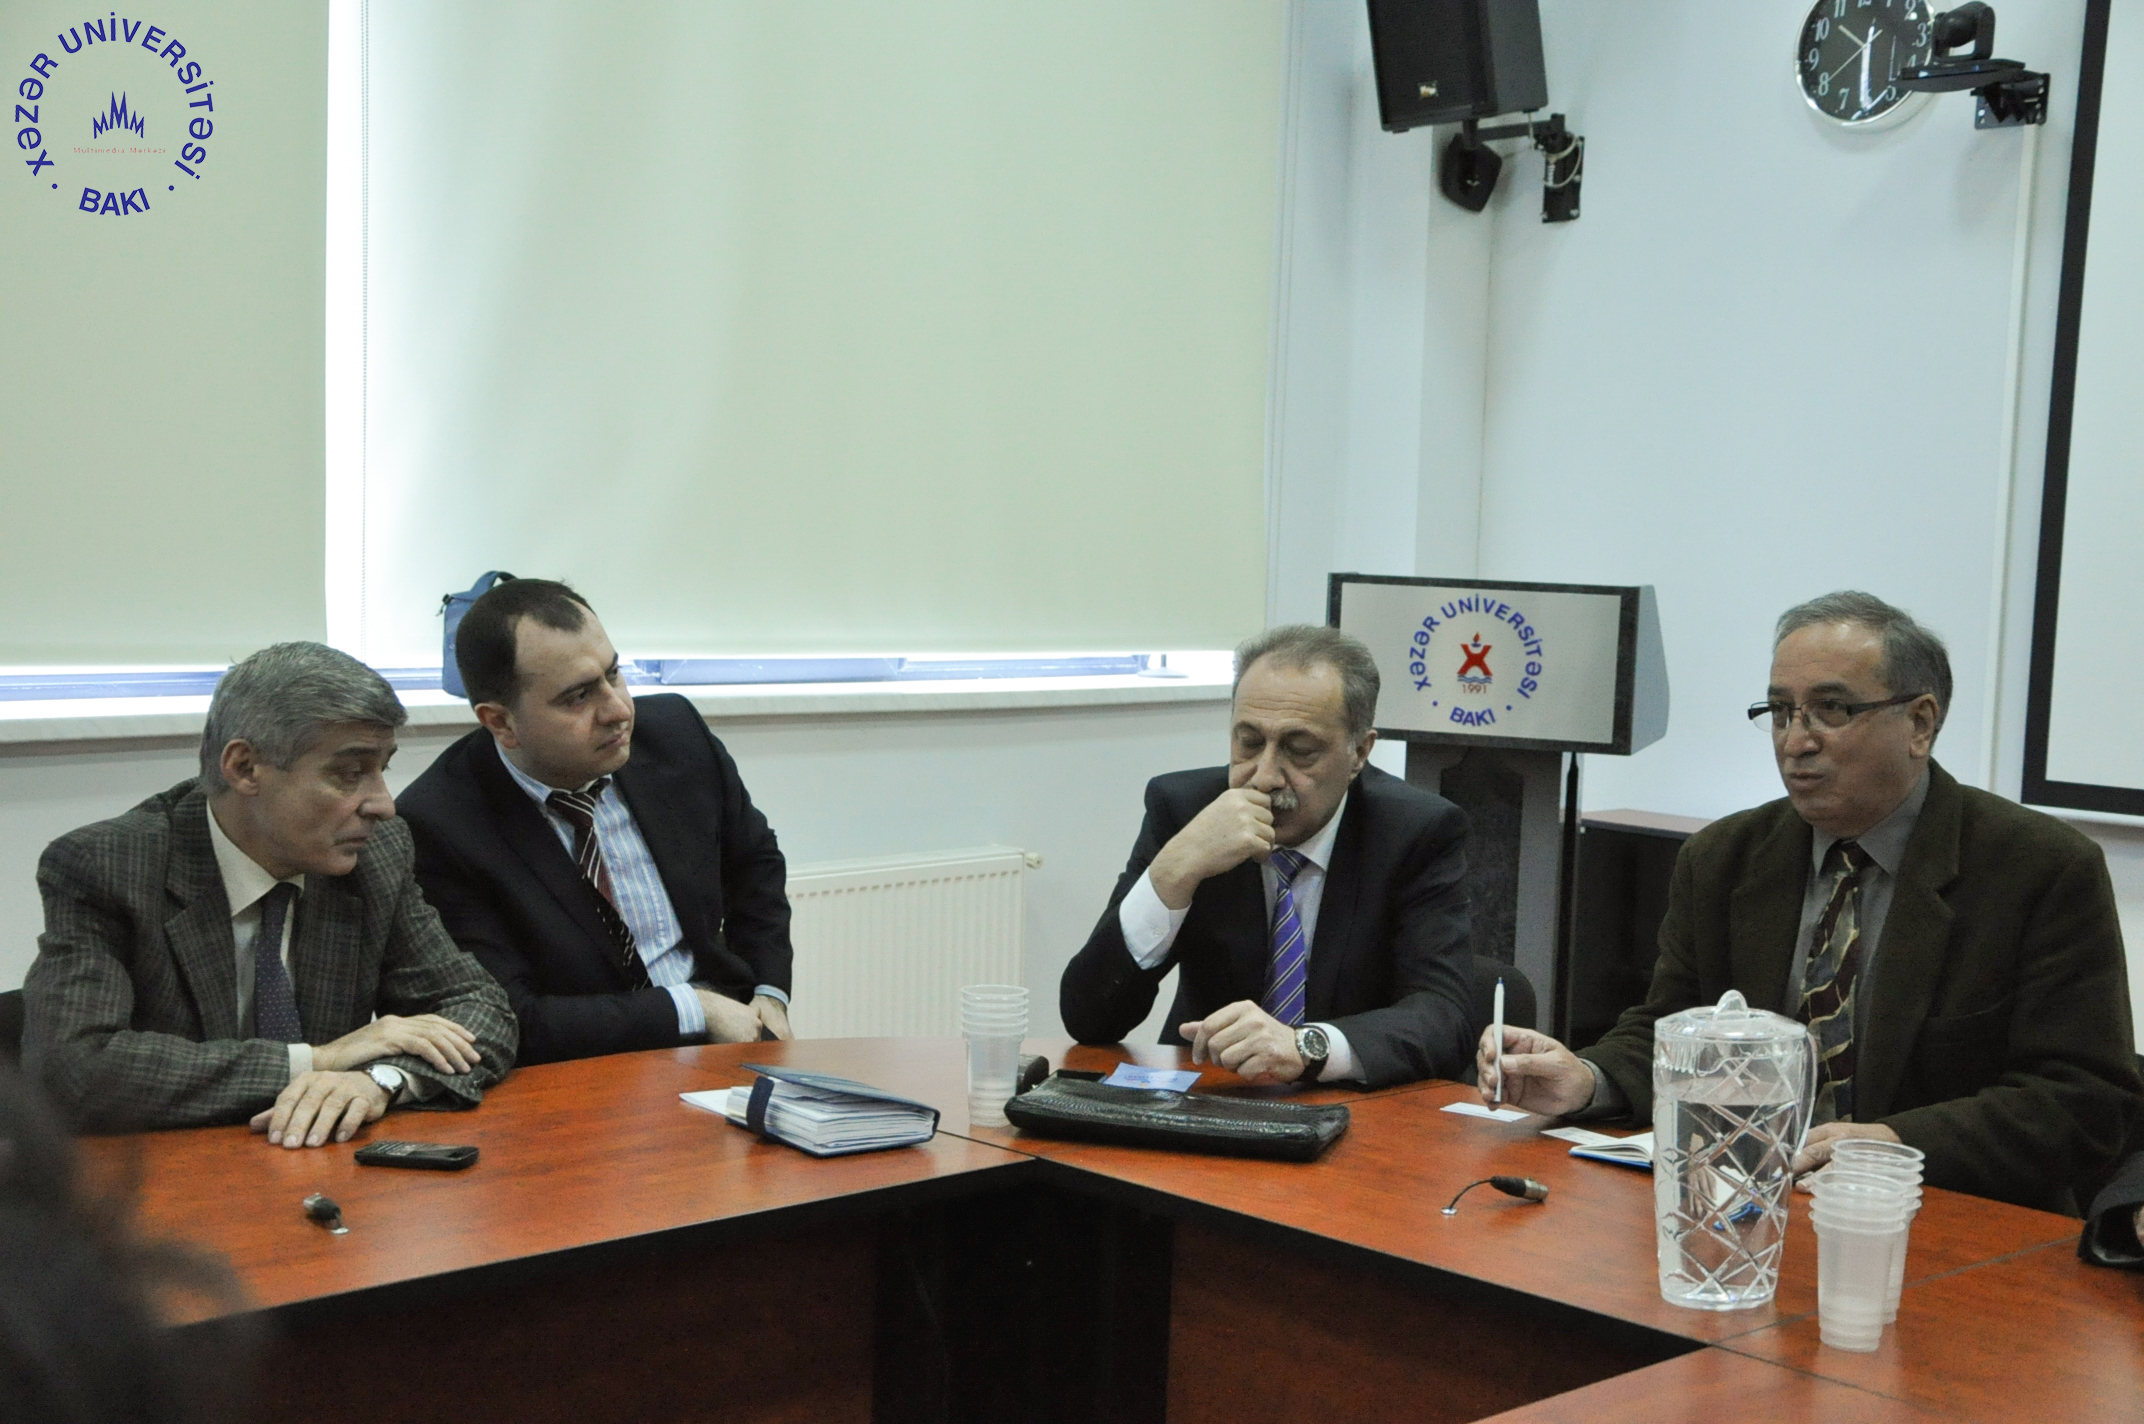 Azerbaijani Multiculturalism Event